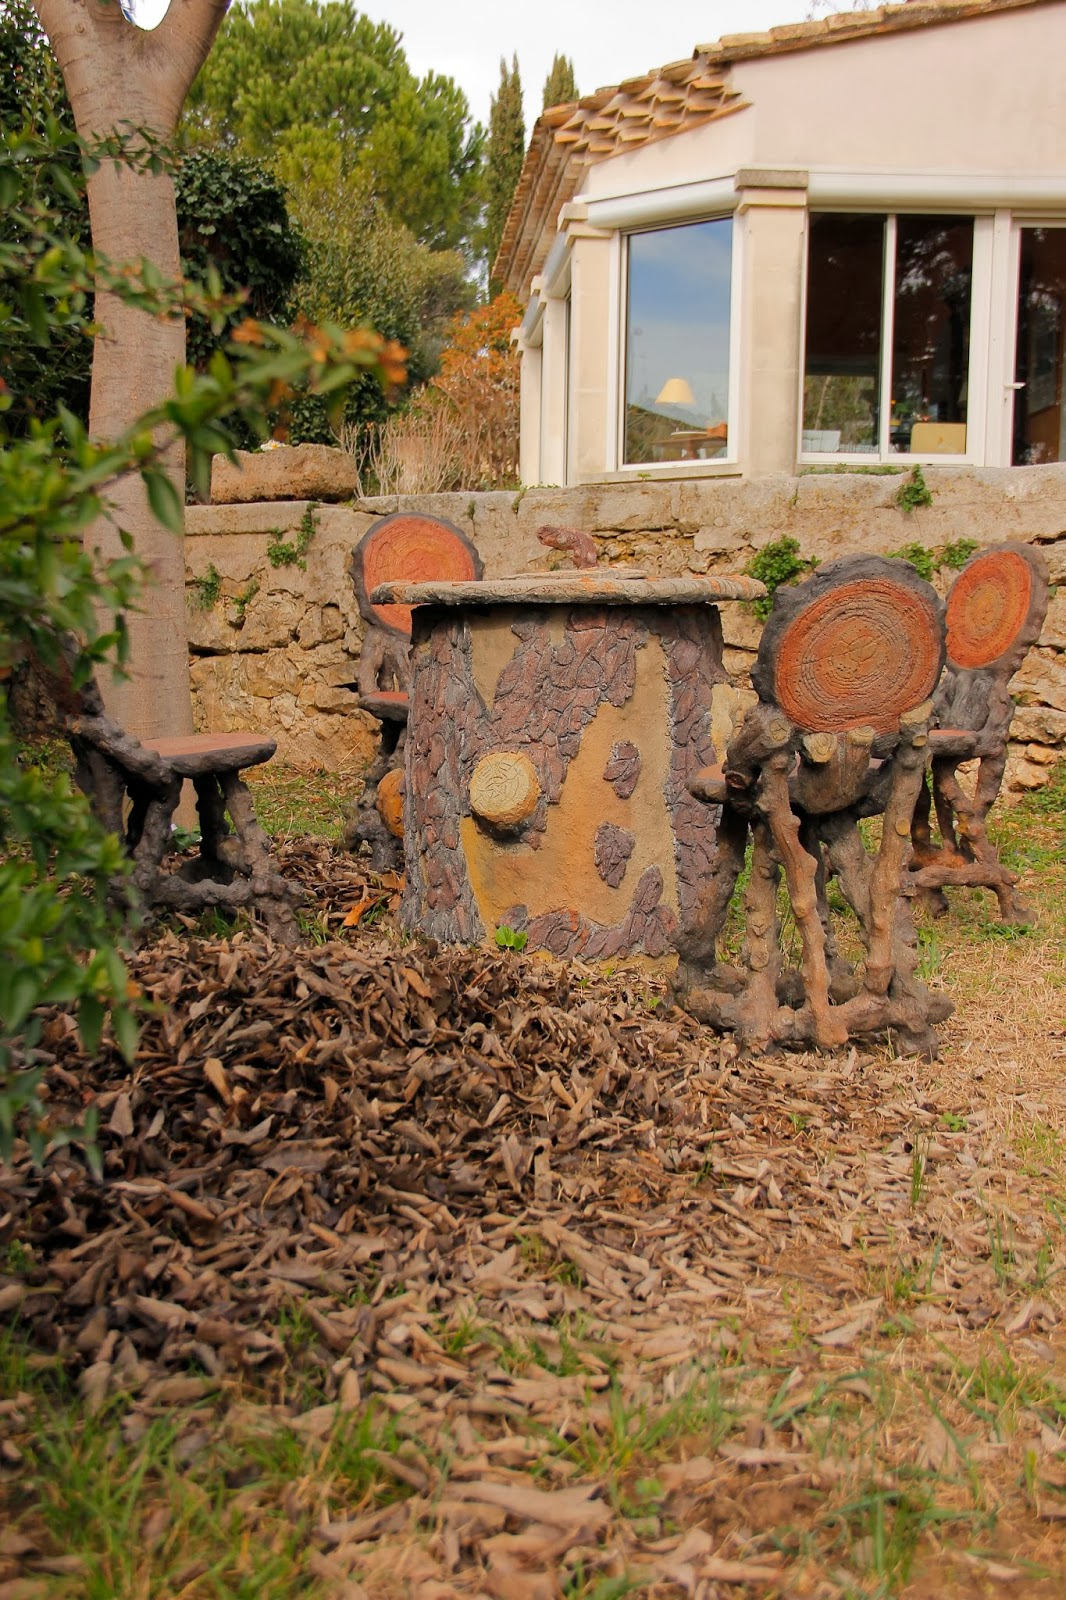 Rocailleurs et jartdin bio georges navarro cailleur jo for Agrementer son jardin